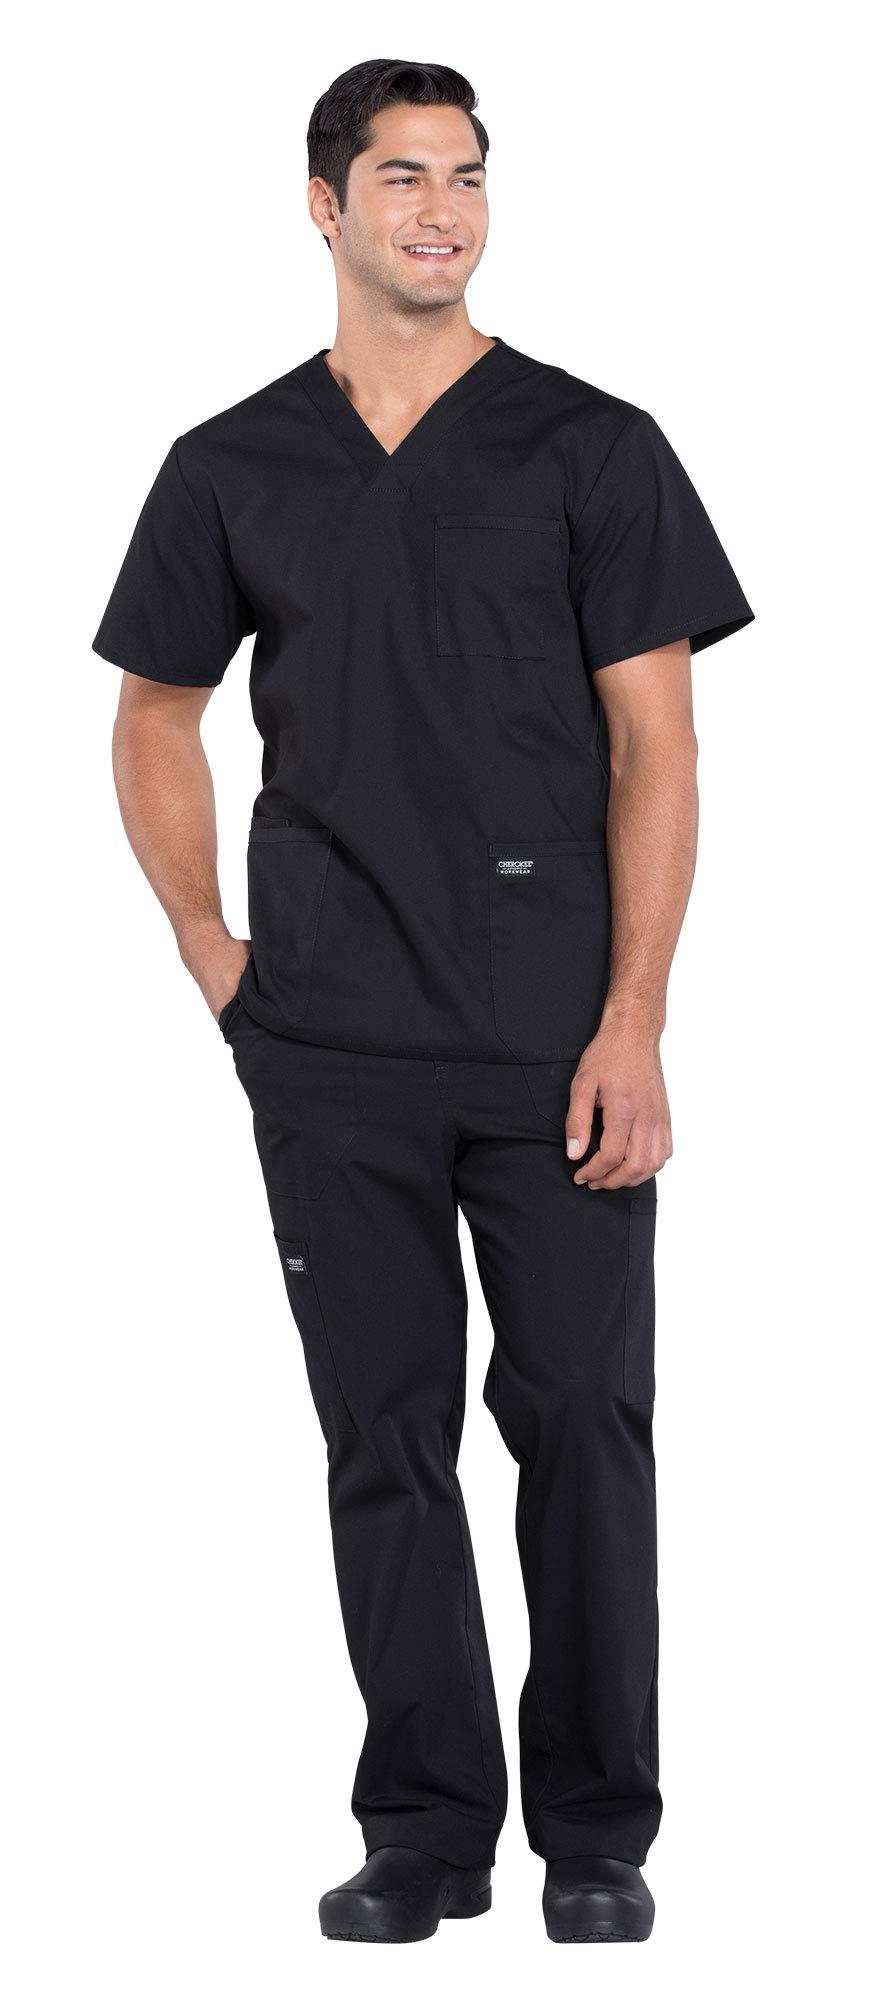 Cherokee Workwear Professionals Men's 4 Pocket V-Neck Scrub Top WW695 & Men's Drawstring Cargo Scrub Pants WW190 Medical Uniforms Scrub Set (Black - Large)